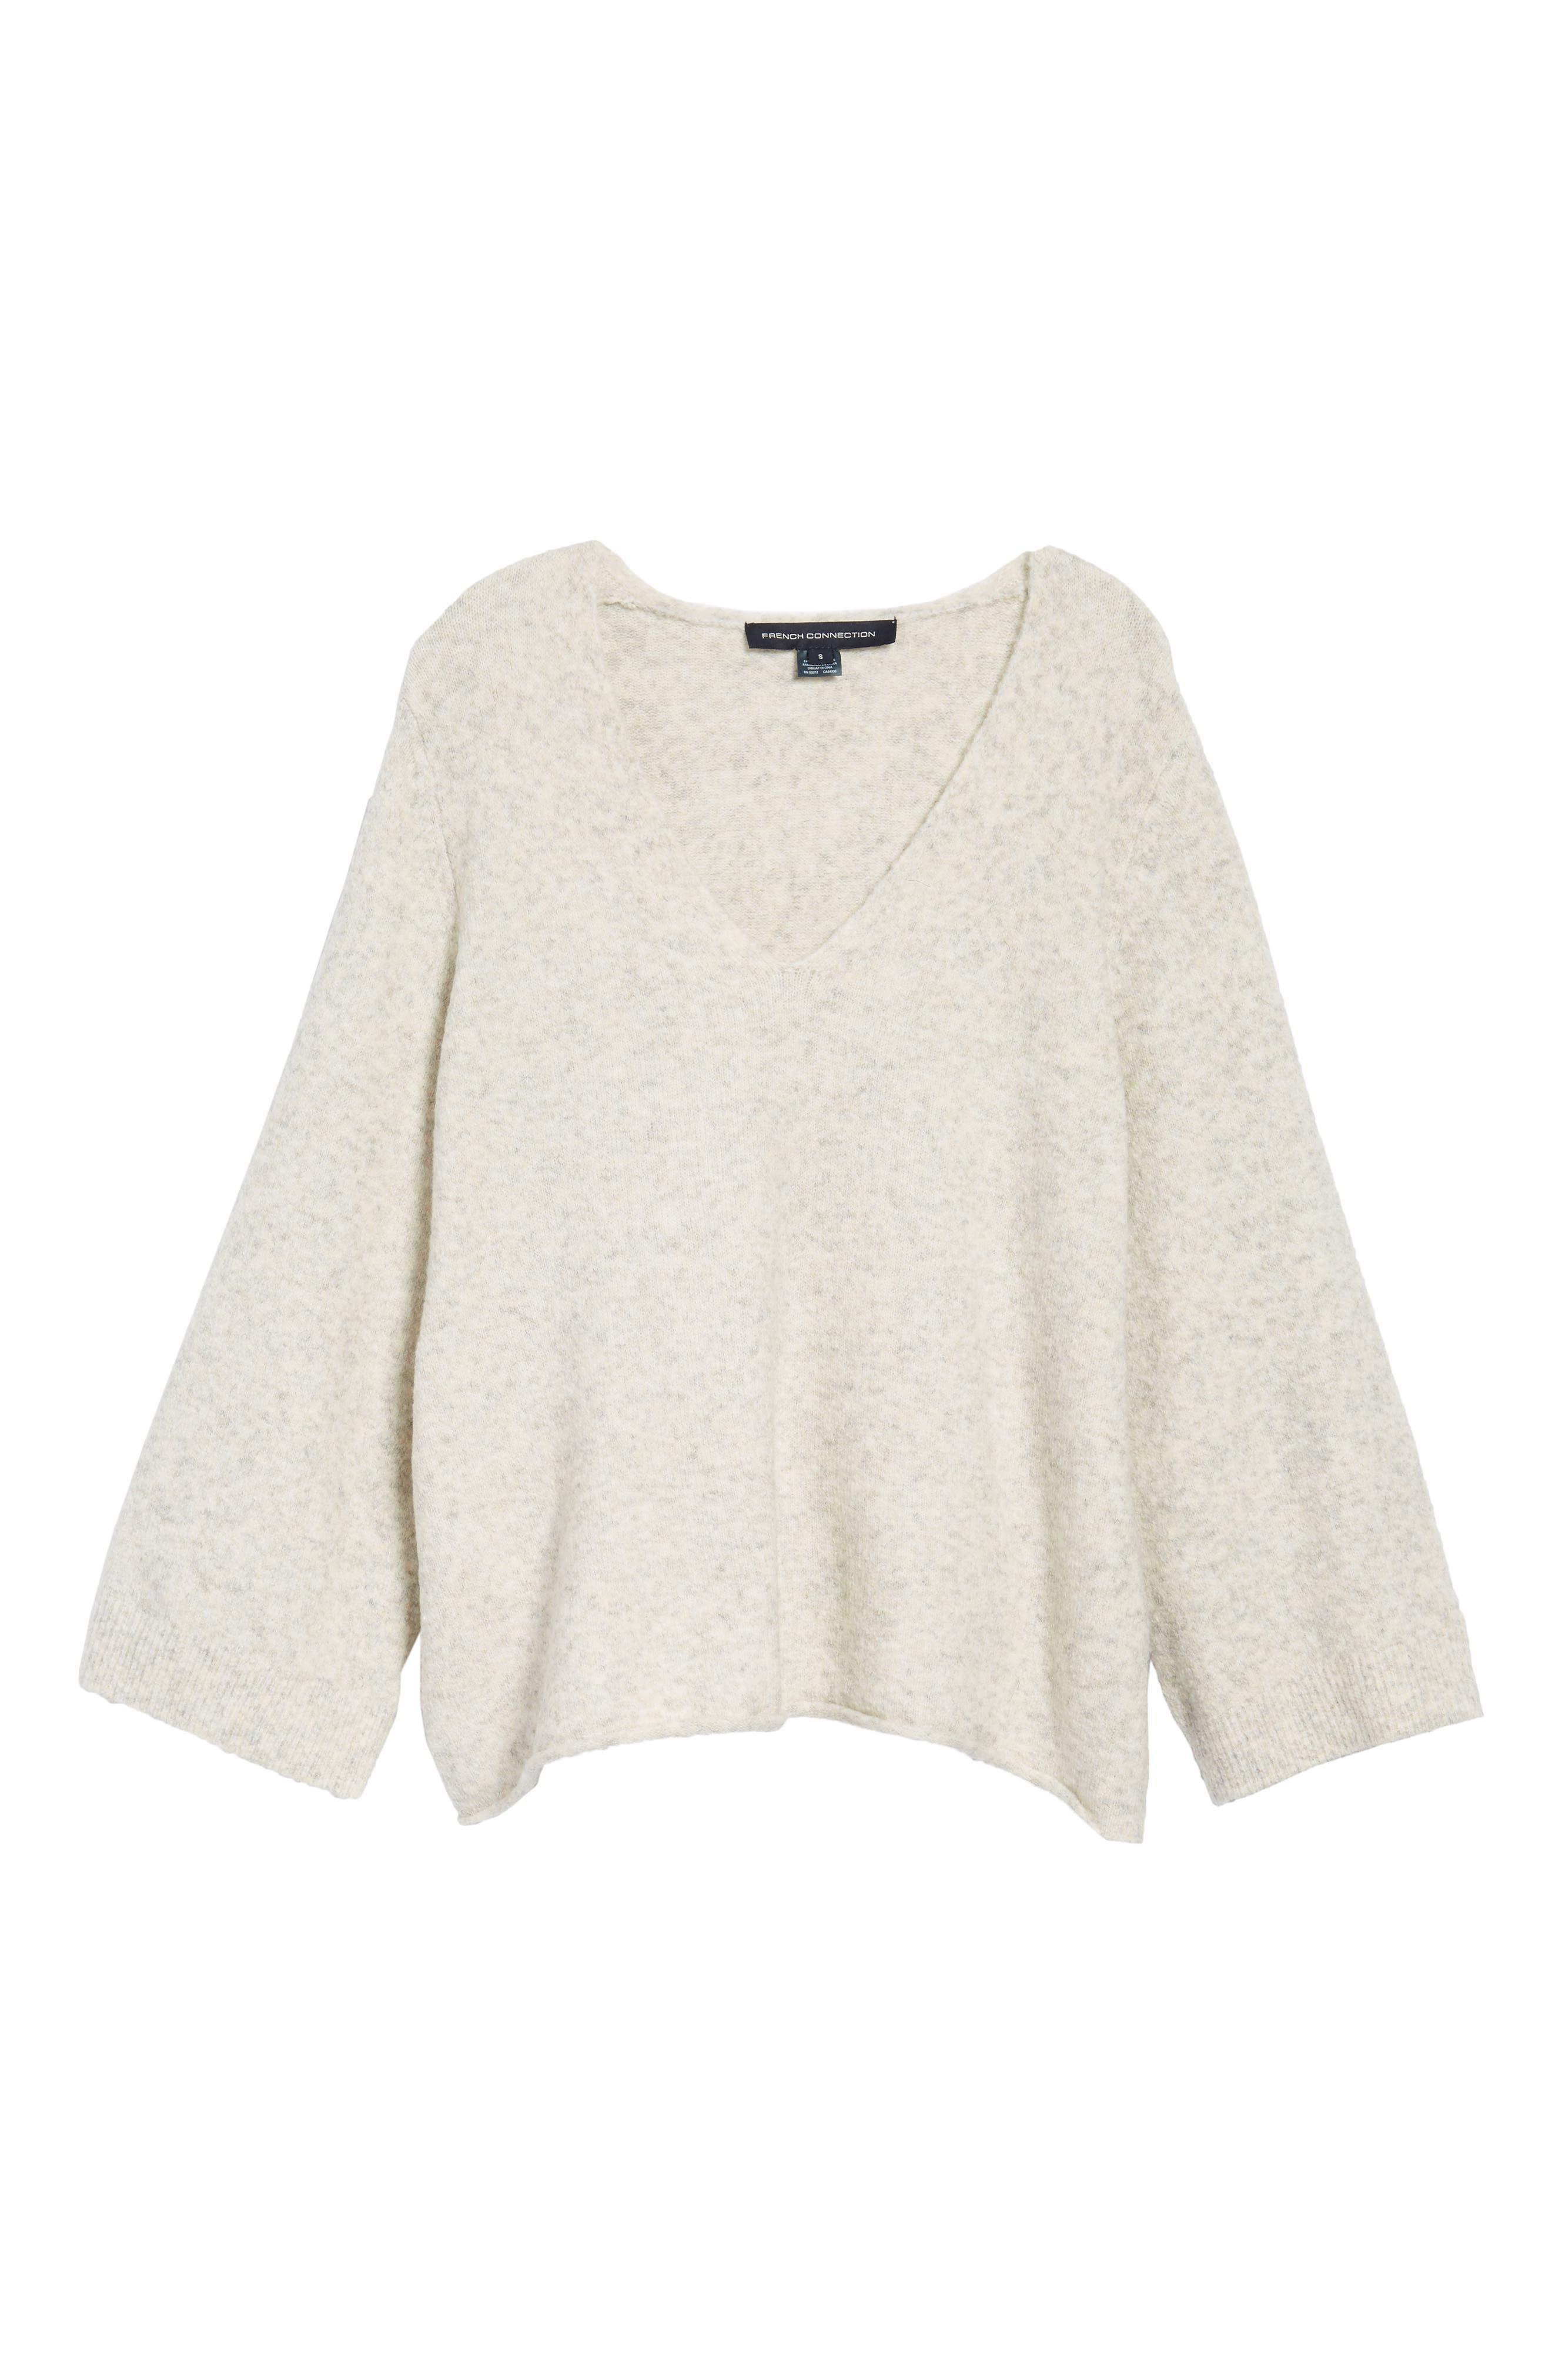 Urban Flossy Sweater,                             Alternate thumbnail 22, color,